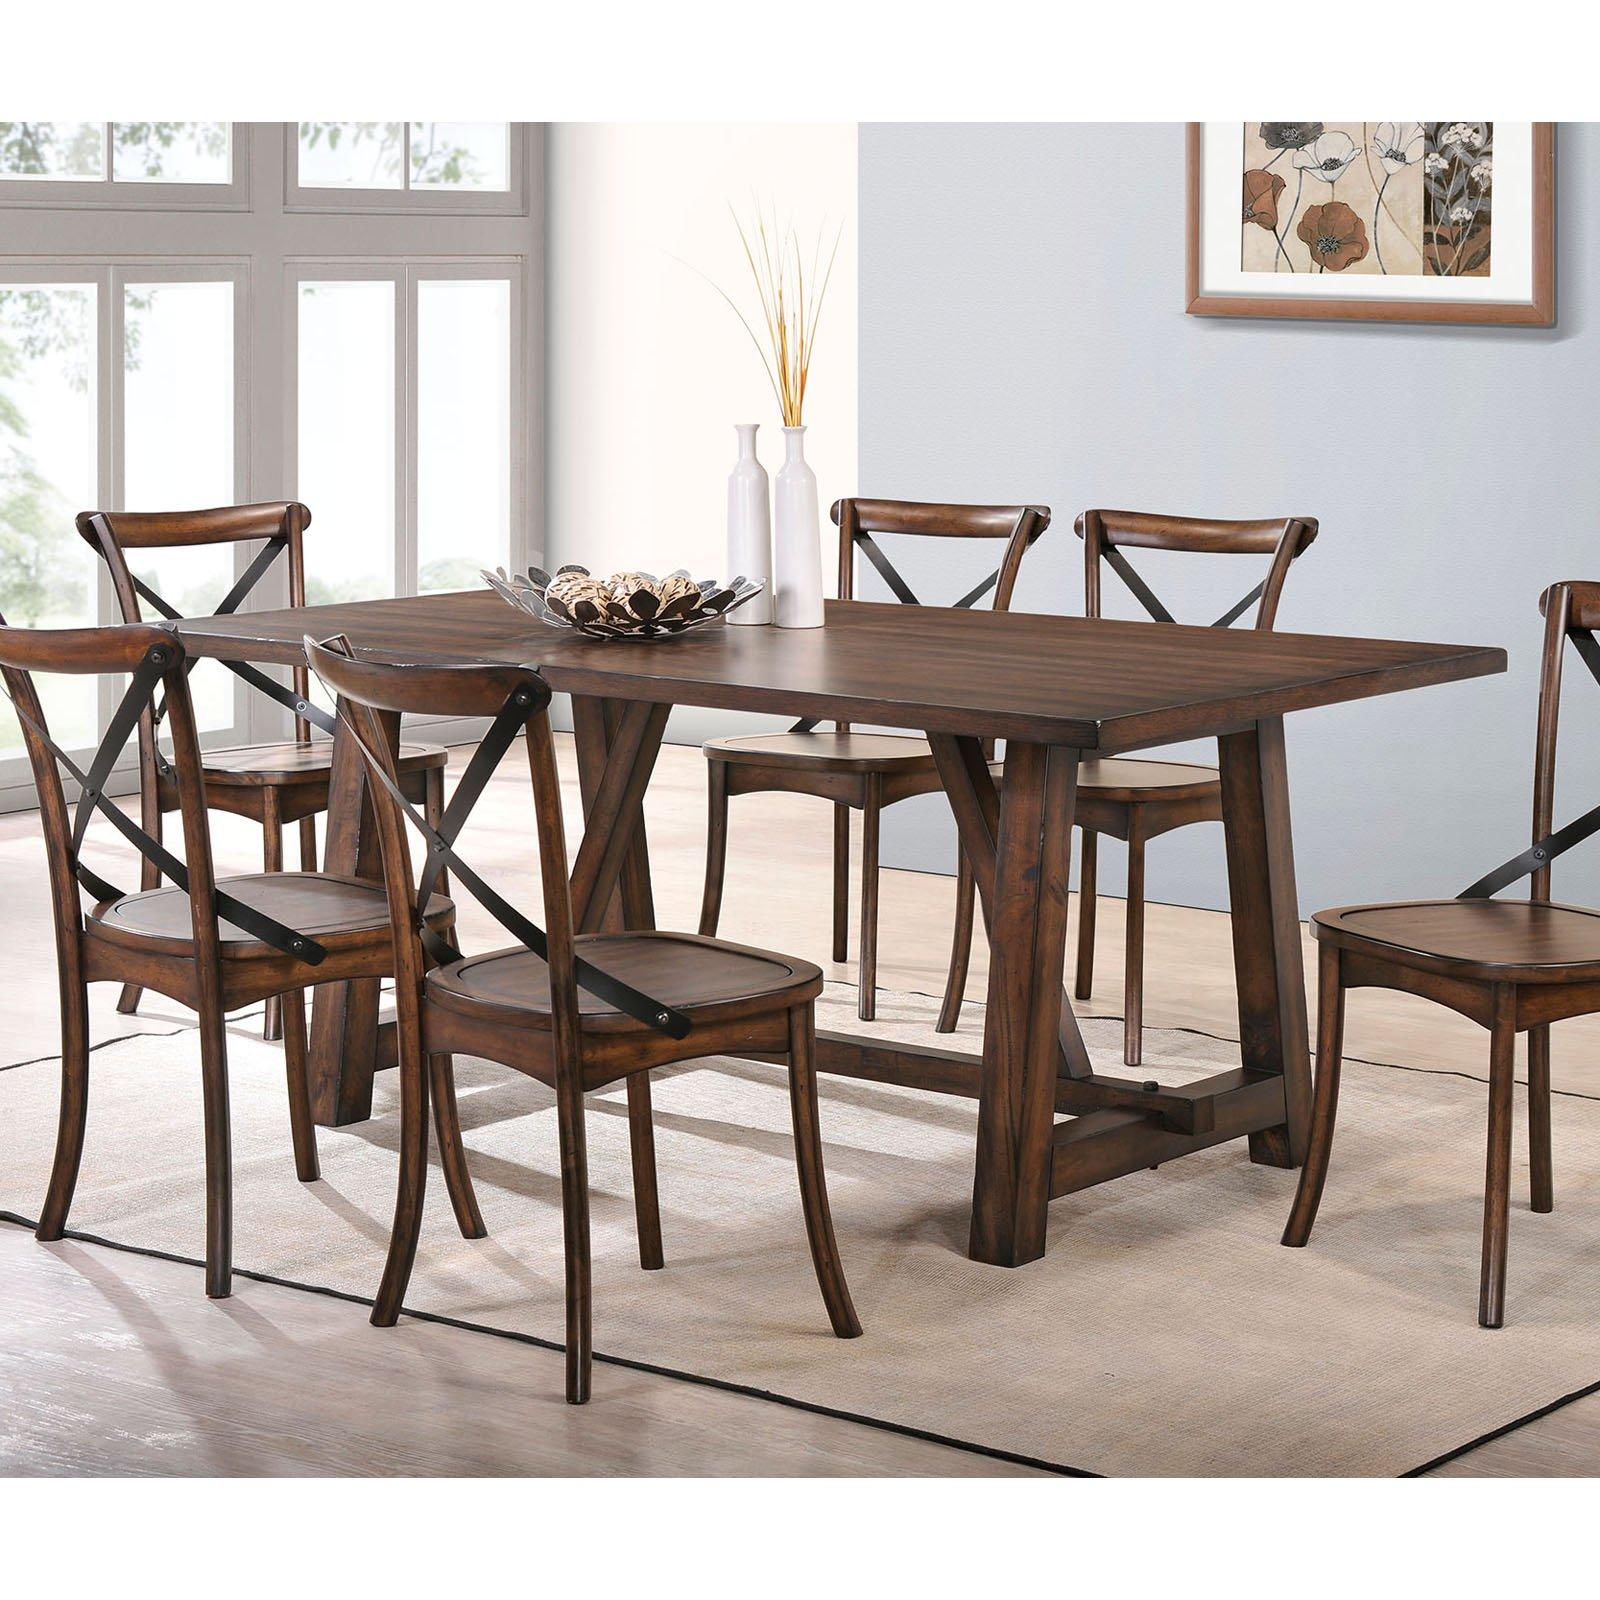 ACME Kaelyn Dining Table, Dark Oak